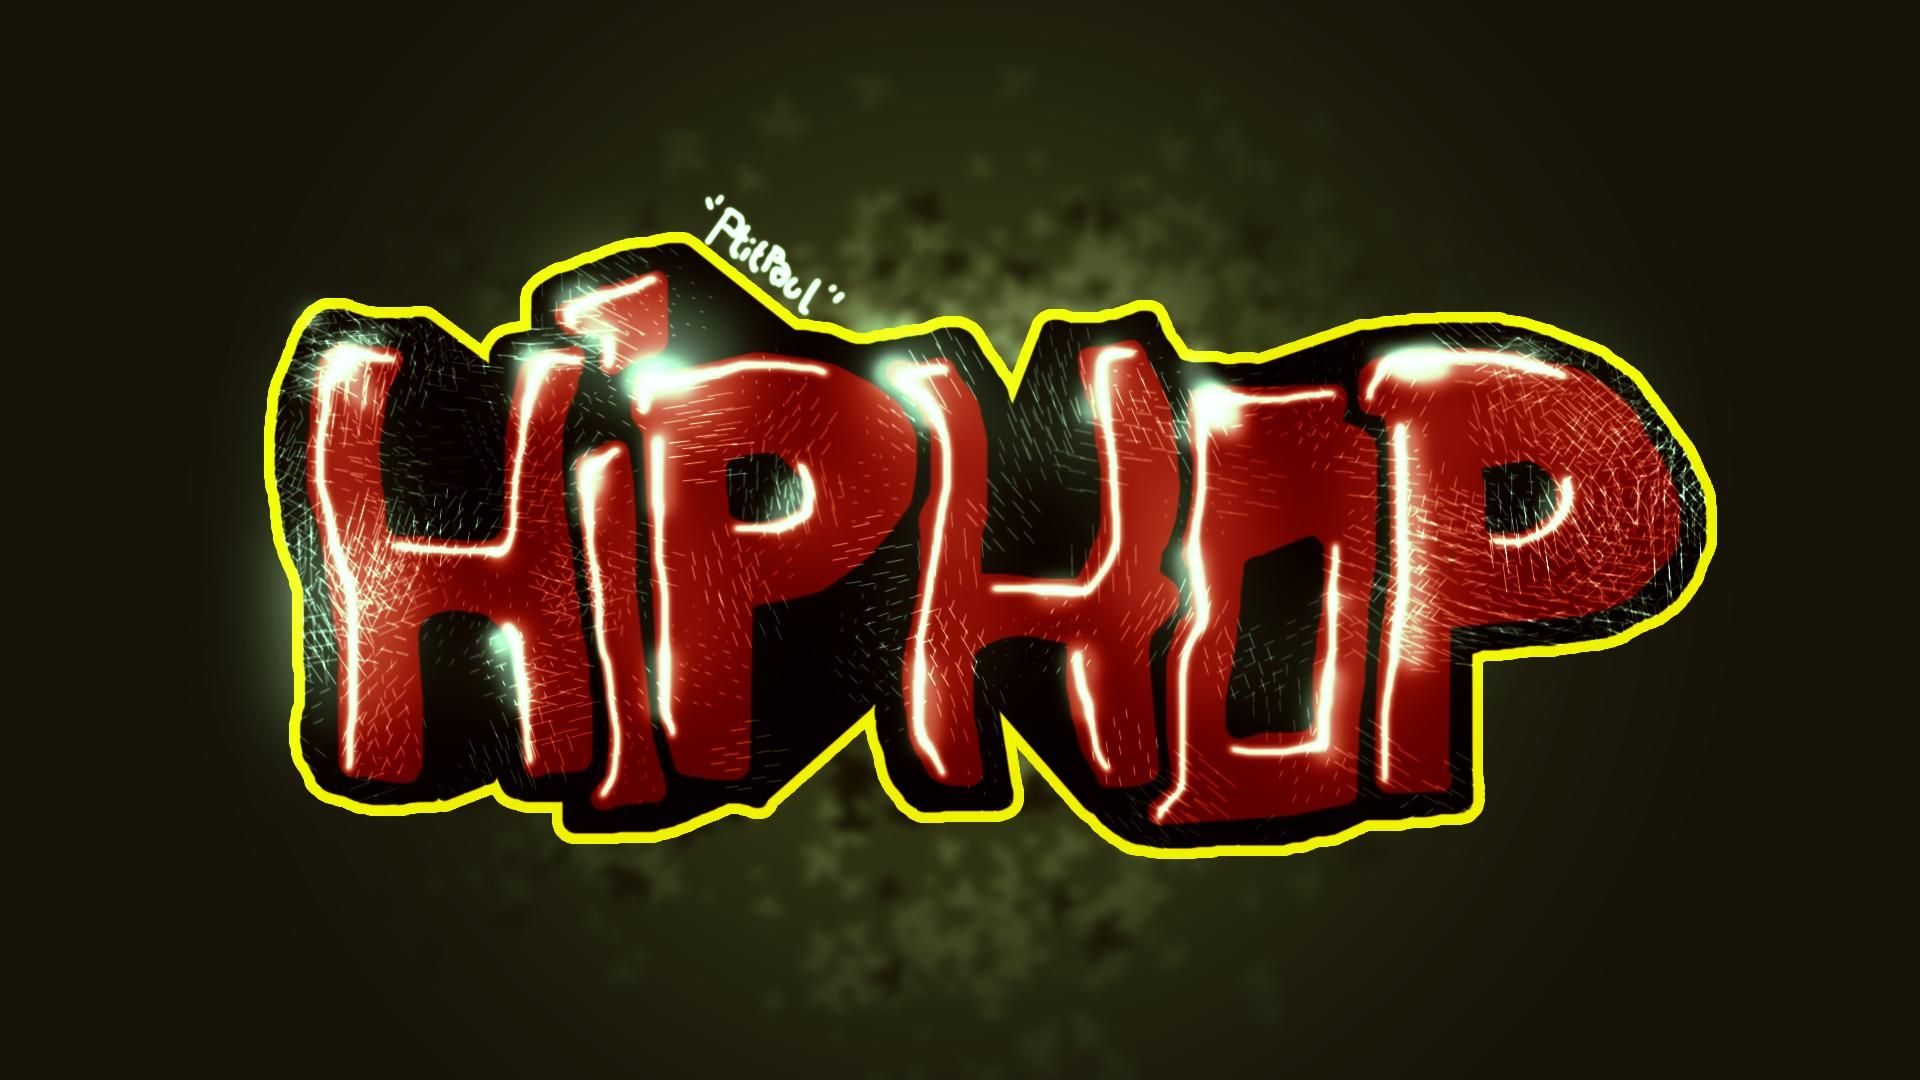 Download Wallpapers Download x black music hip hop rap